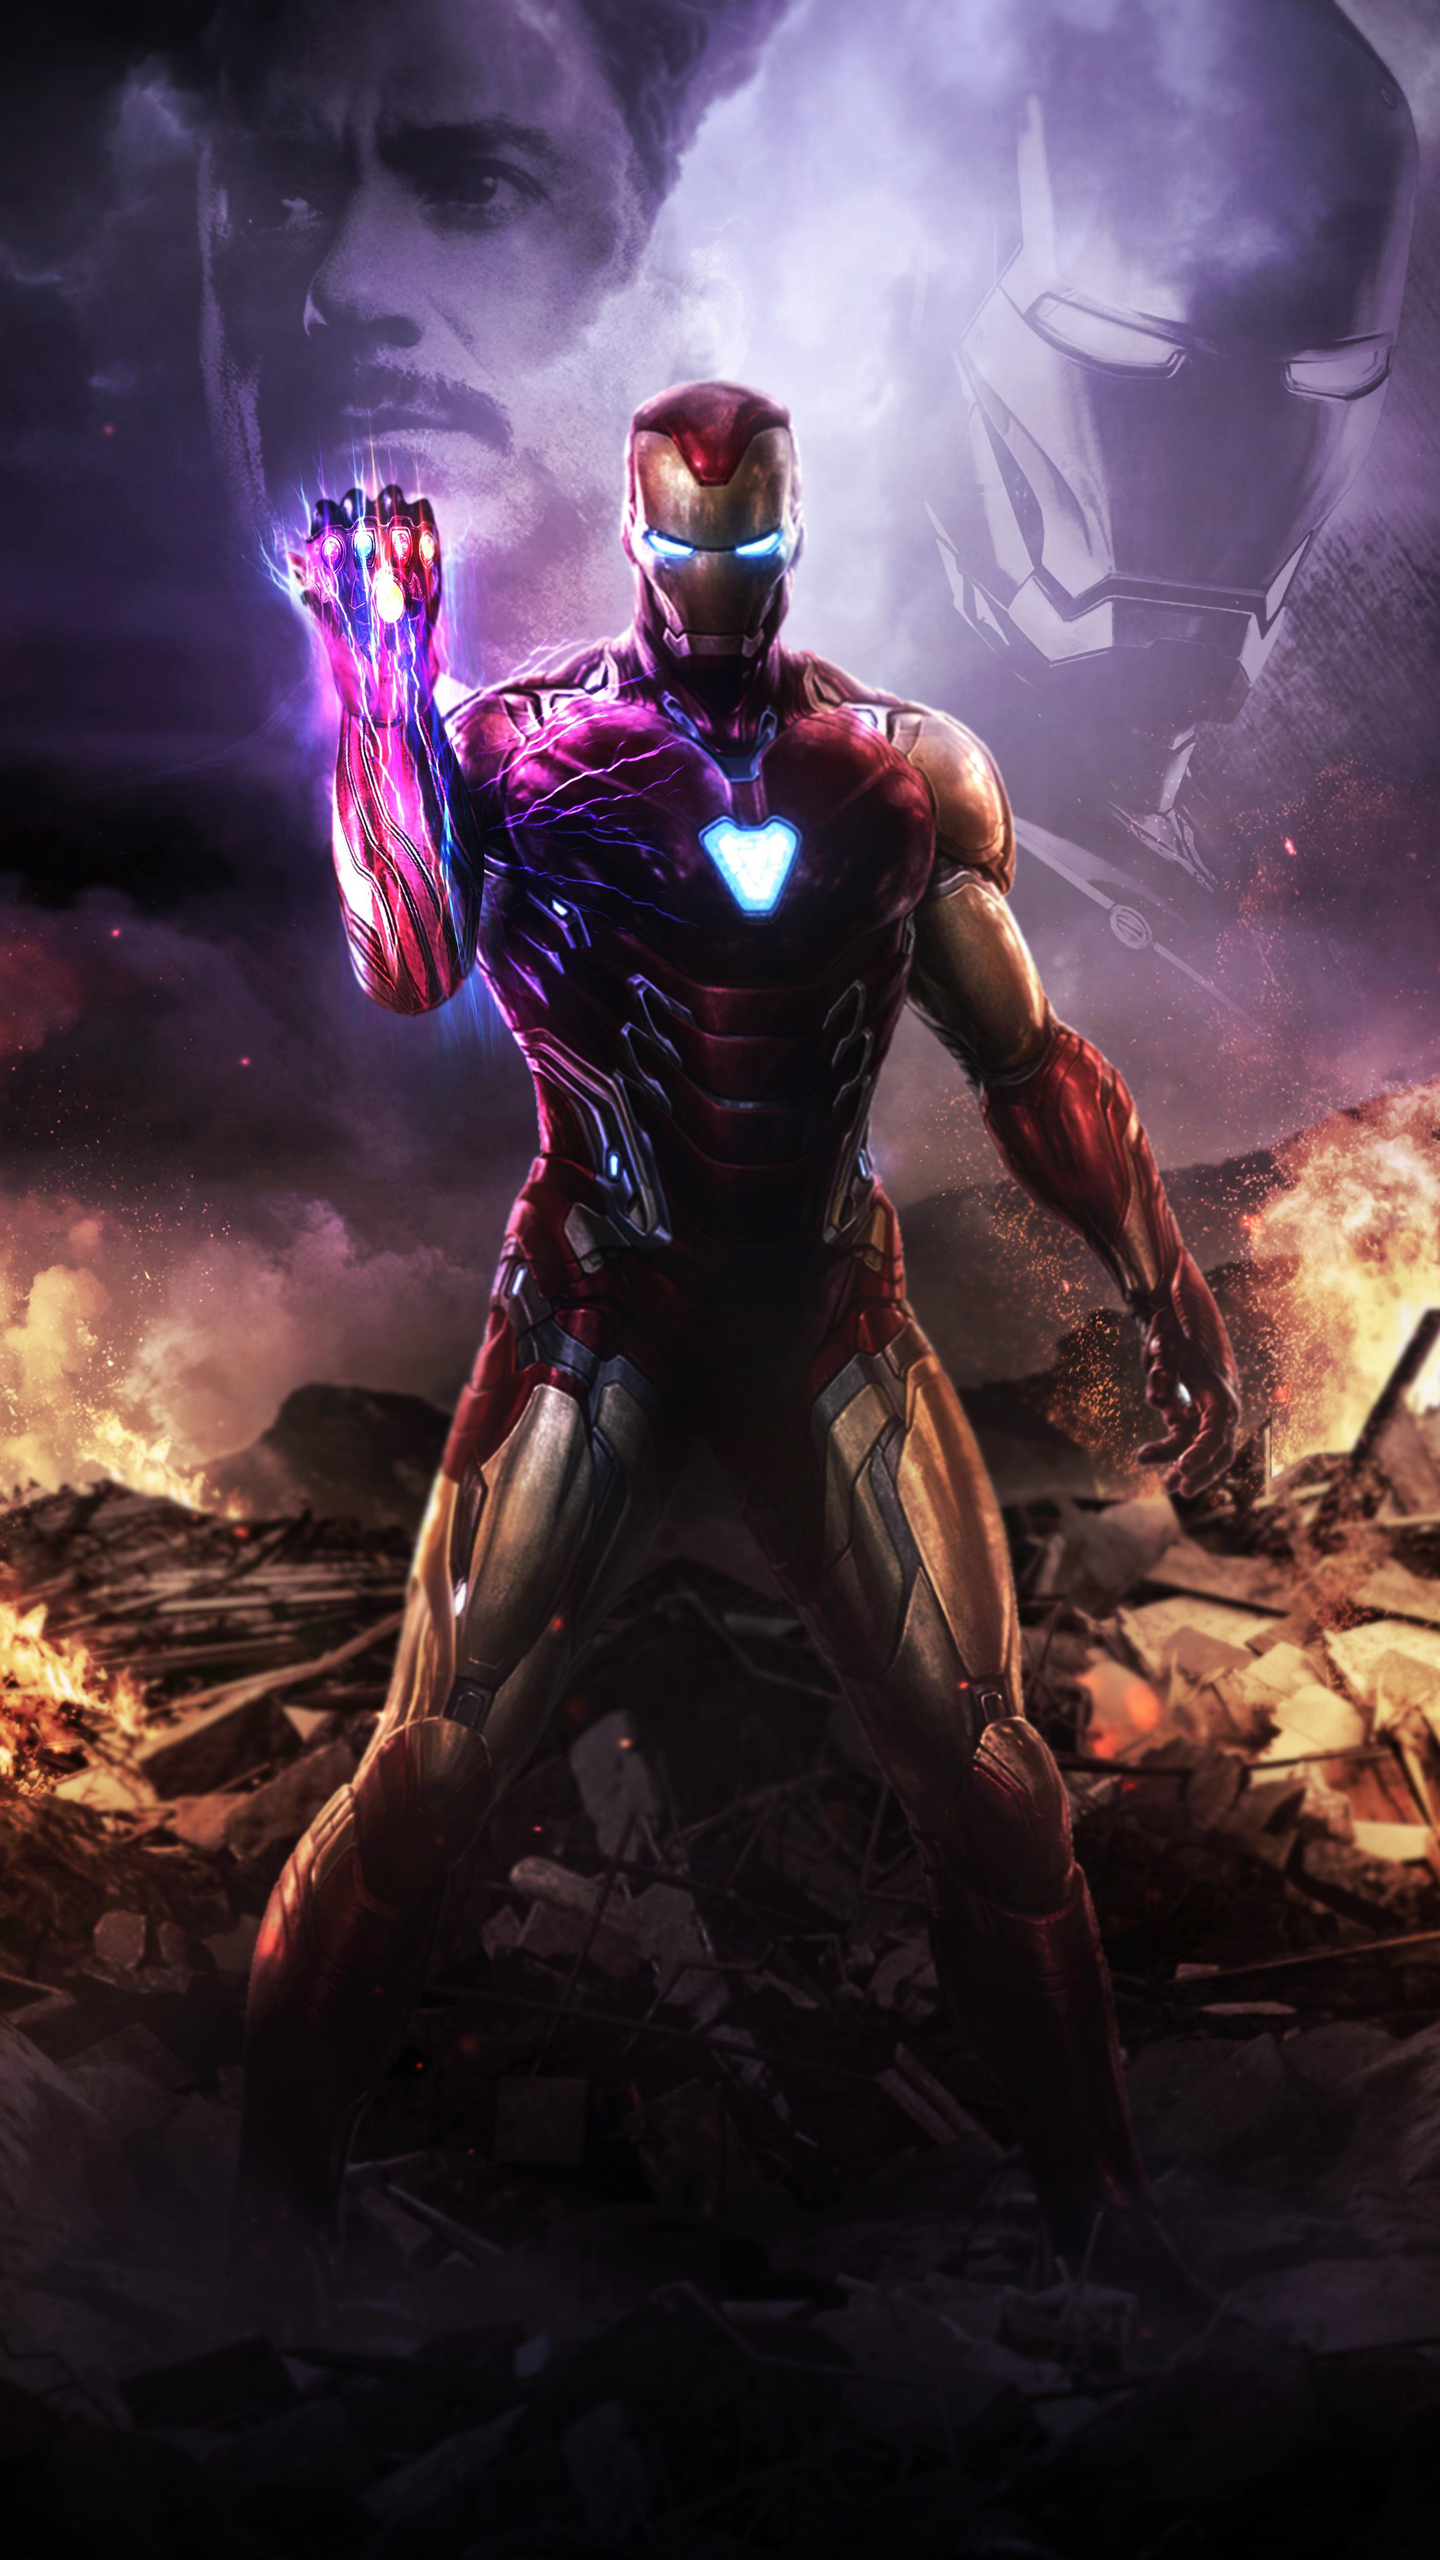 1440x2560 Iron Man Infinity Gauntlet 4k Samsung Galaxy S6s7